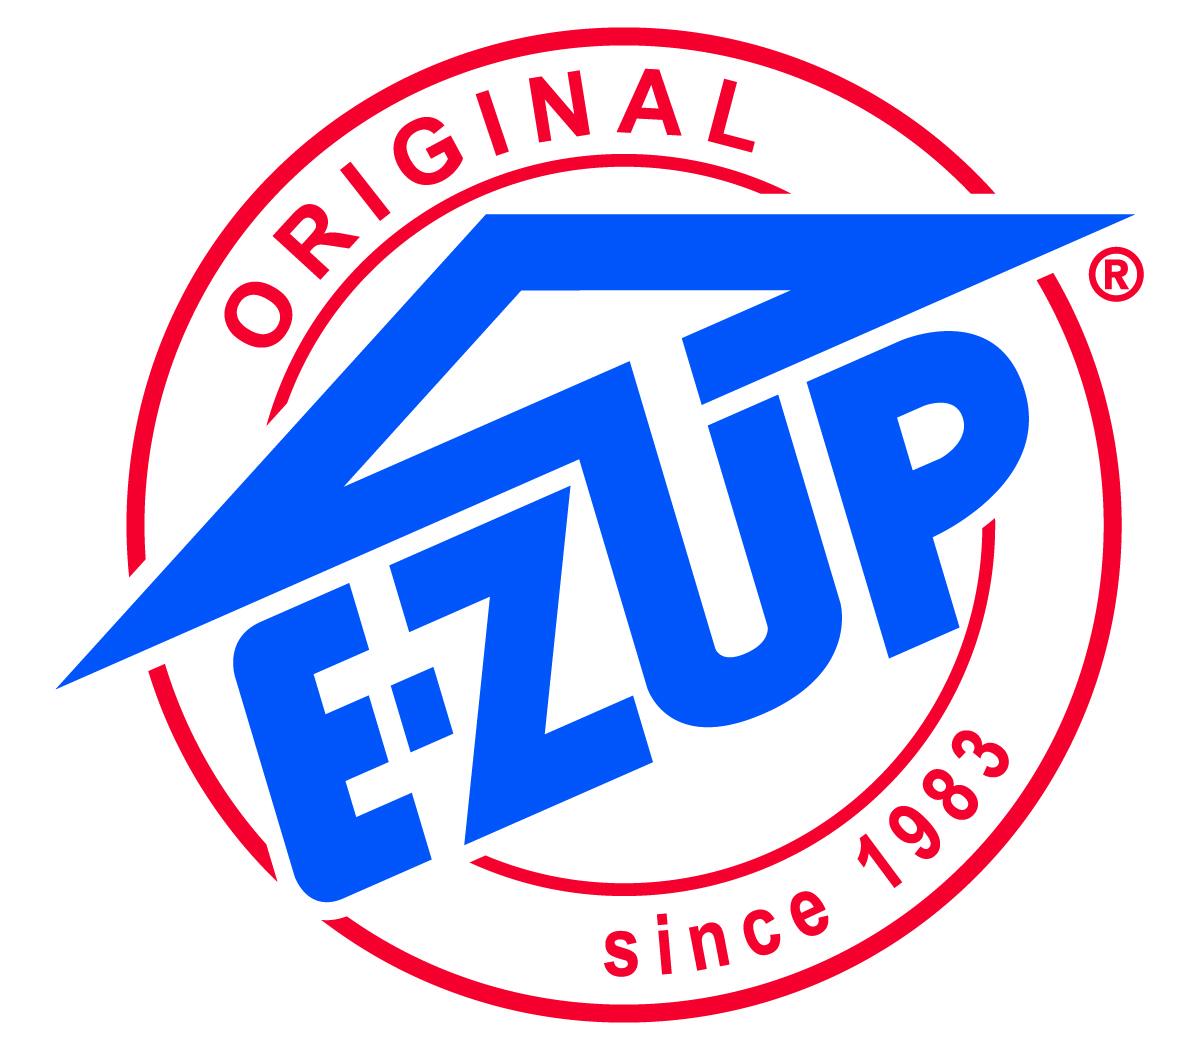 EZ UP Logo Wallpaper